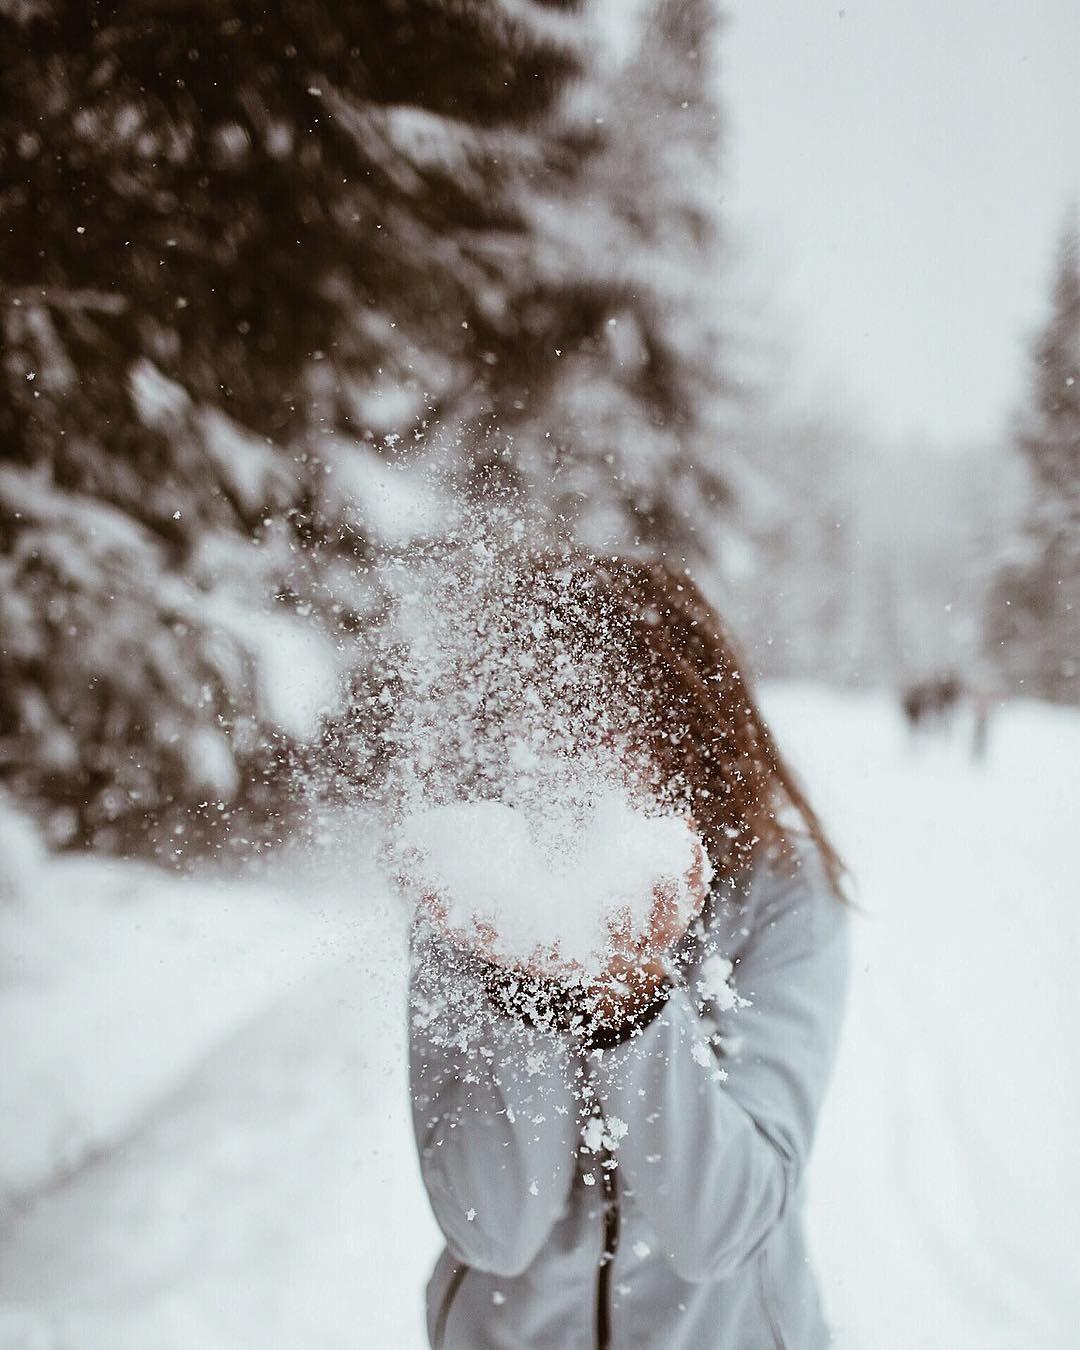 "Sylwia Wyrwicka on Instagram: ""Can not imagine winter wonderland without snow 🌬🌨 . Na dobry sen, trochę lekkiego puchu 😉🌬 . . #winterwonderland #snowtime #wintertime…"""